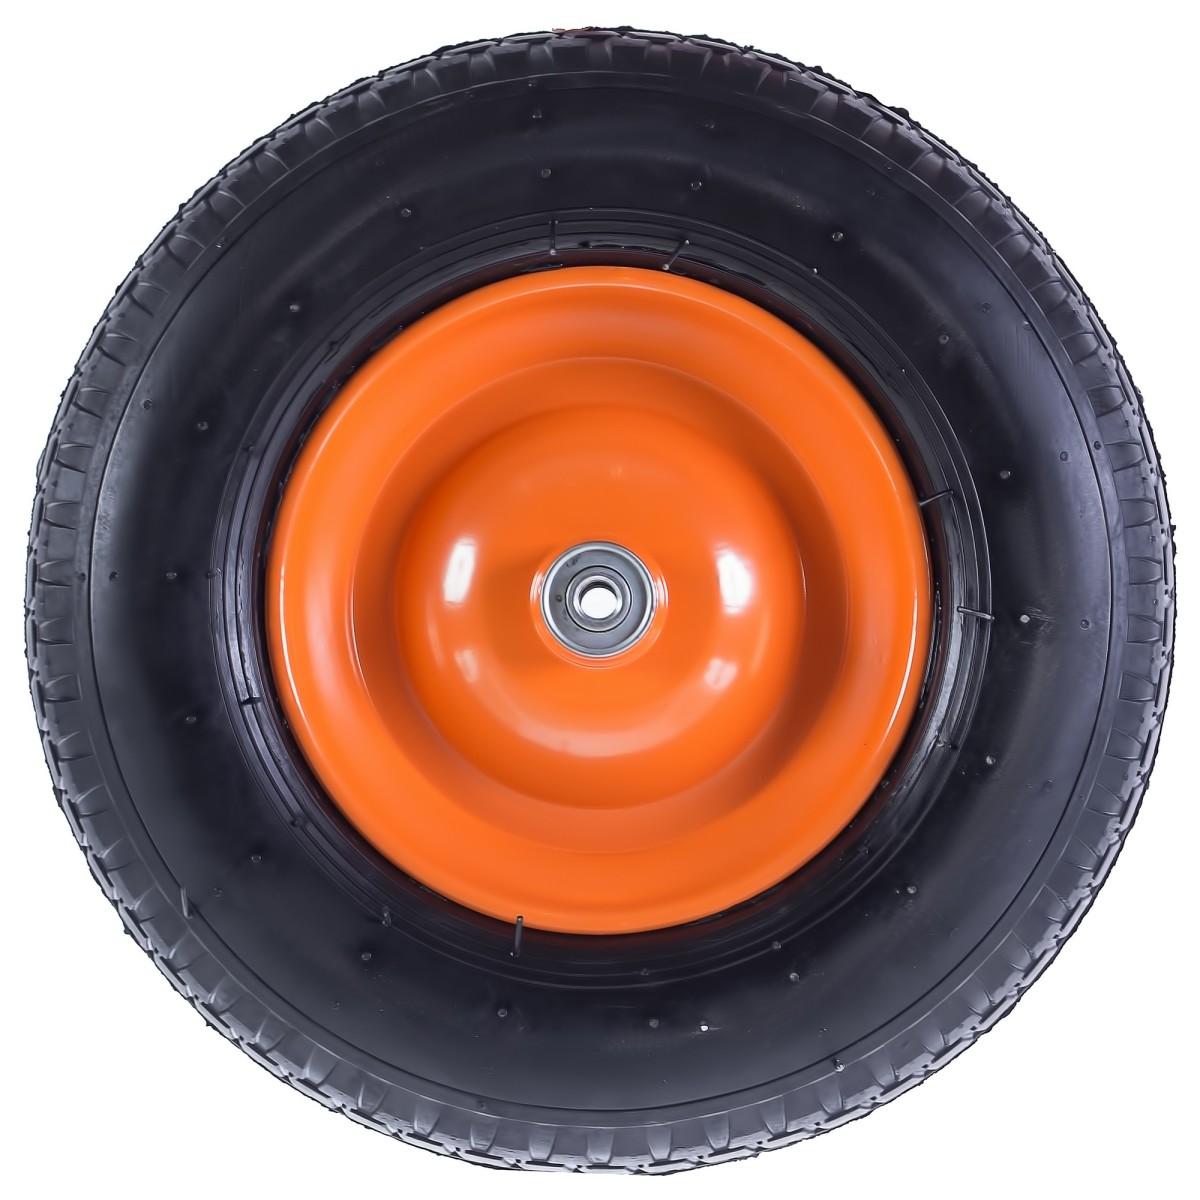 Колесо для тачки пневматическое Palisad 689833 размер 4.80/4.00-8 диаметр втулки 12 мм. D380 мм.